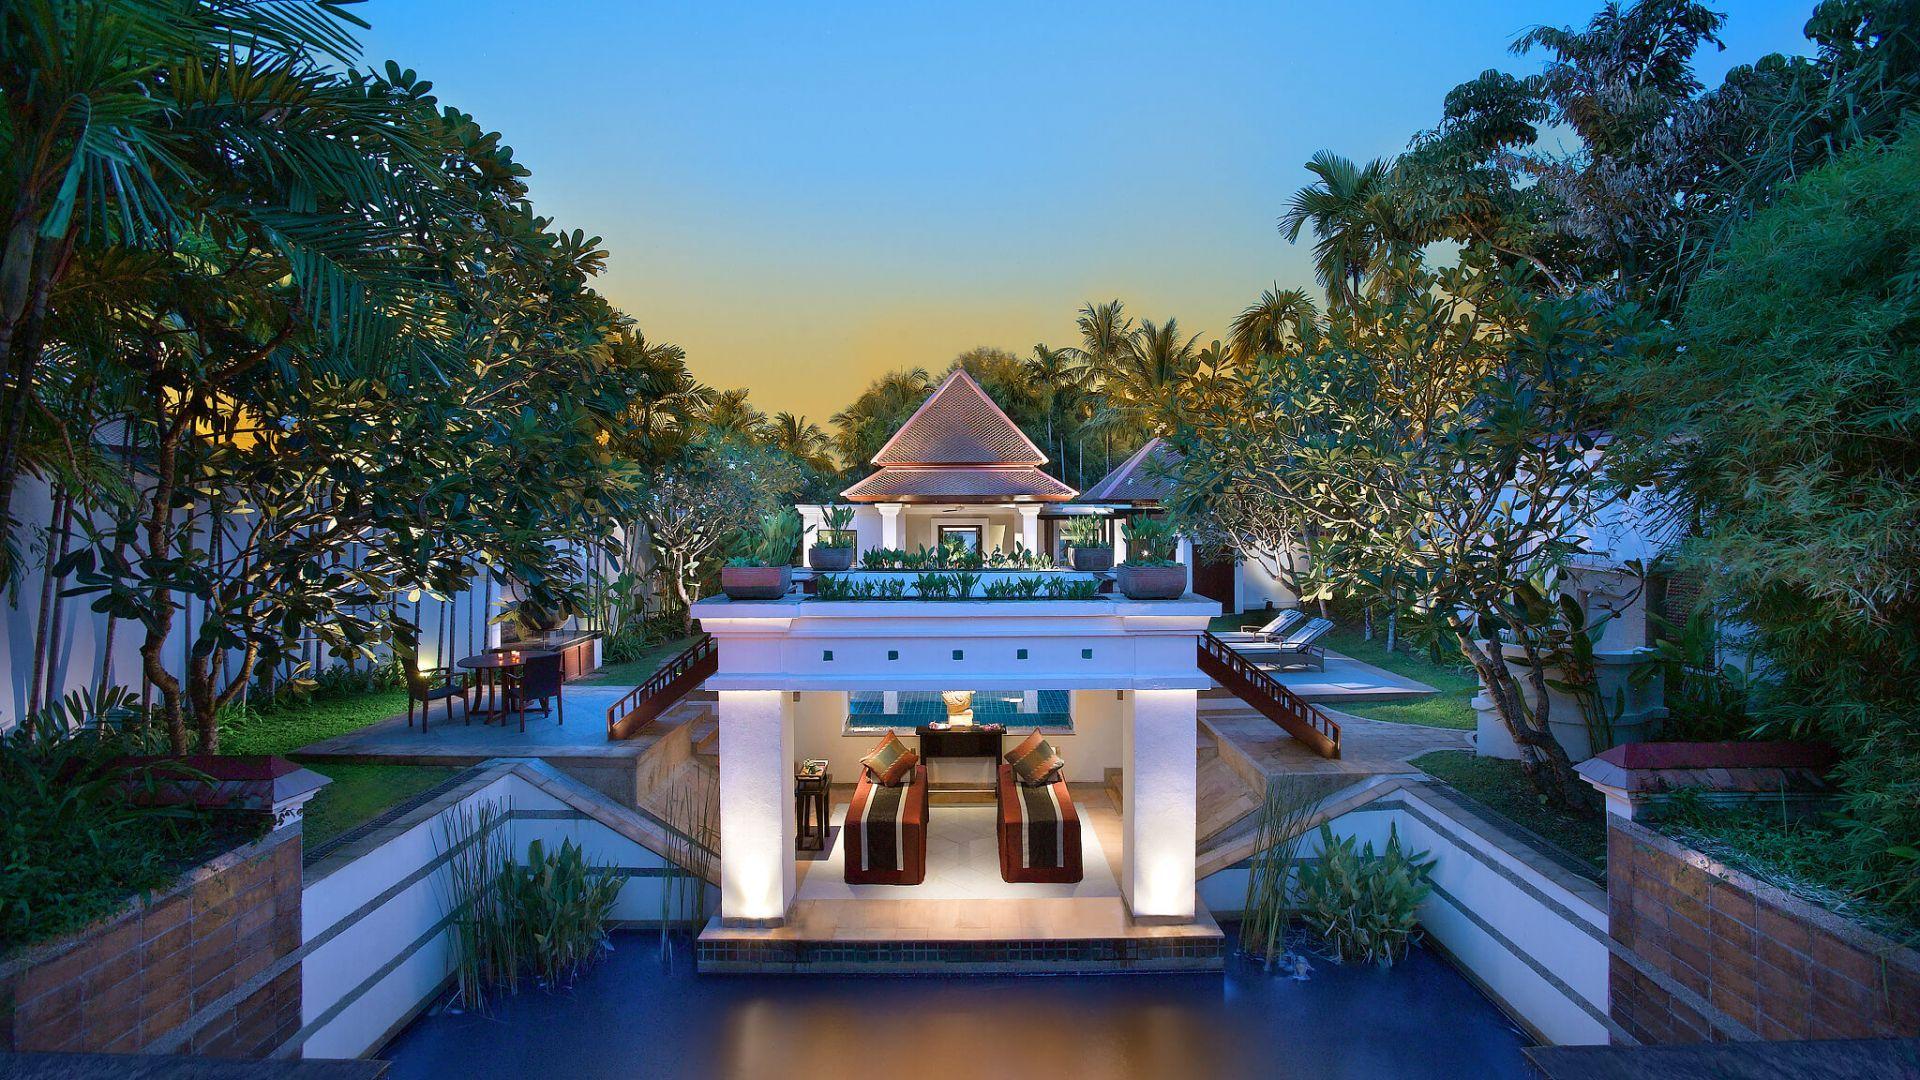 Iniala Luxus Villa Am Strand A Cero Iniala Beach House By A Cero ...